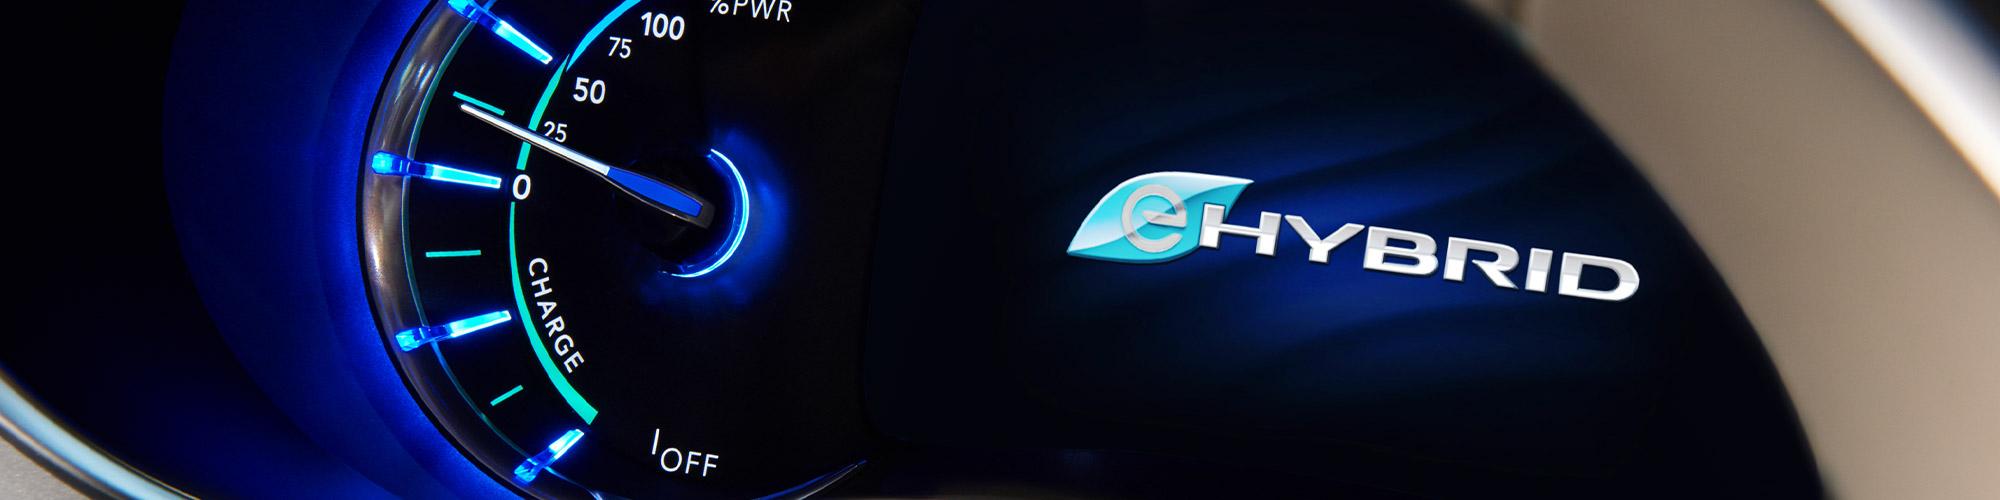 Chrysler Pacifica Hybrid price